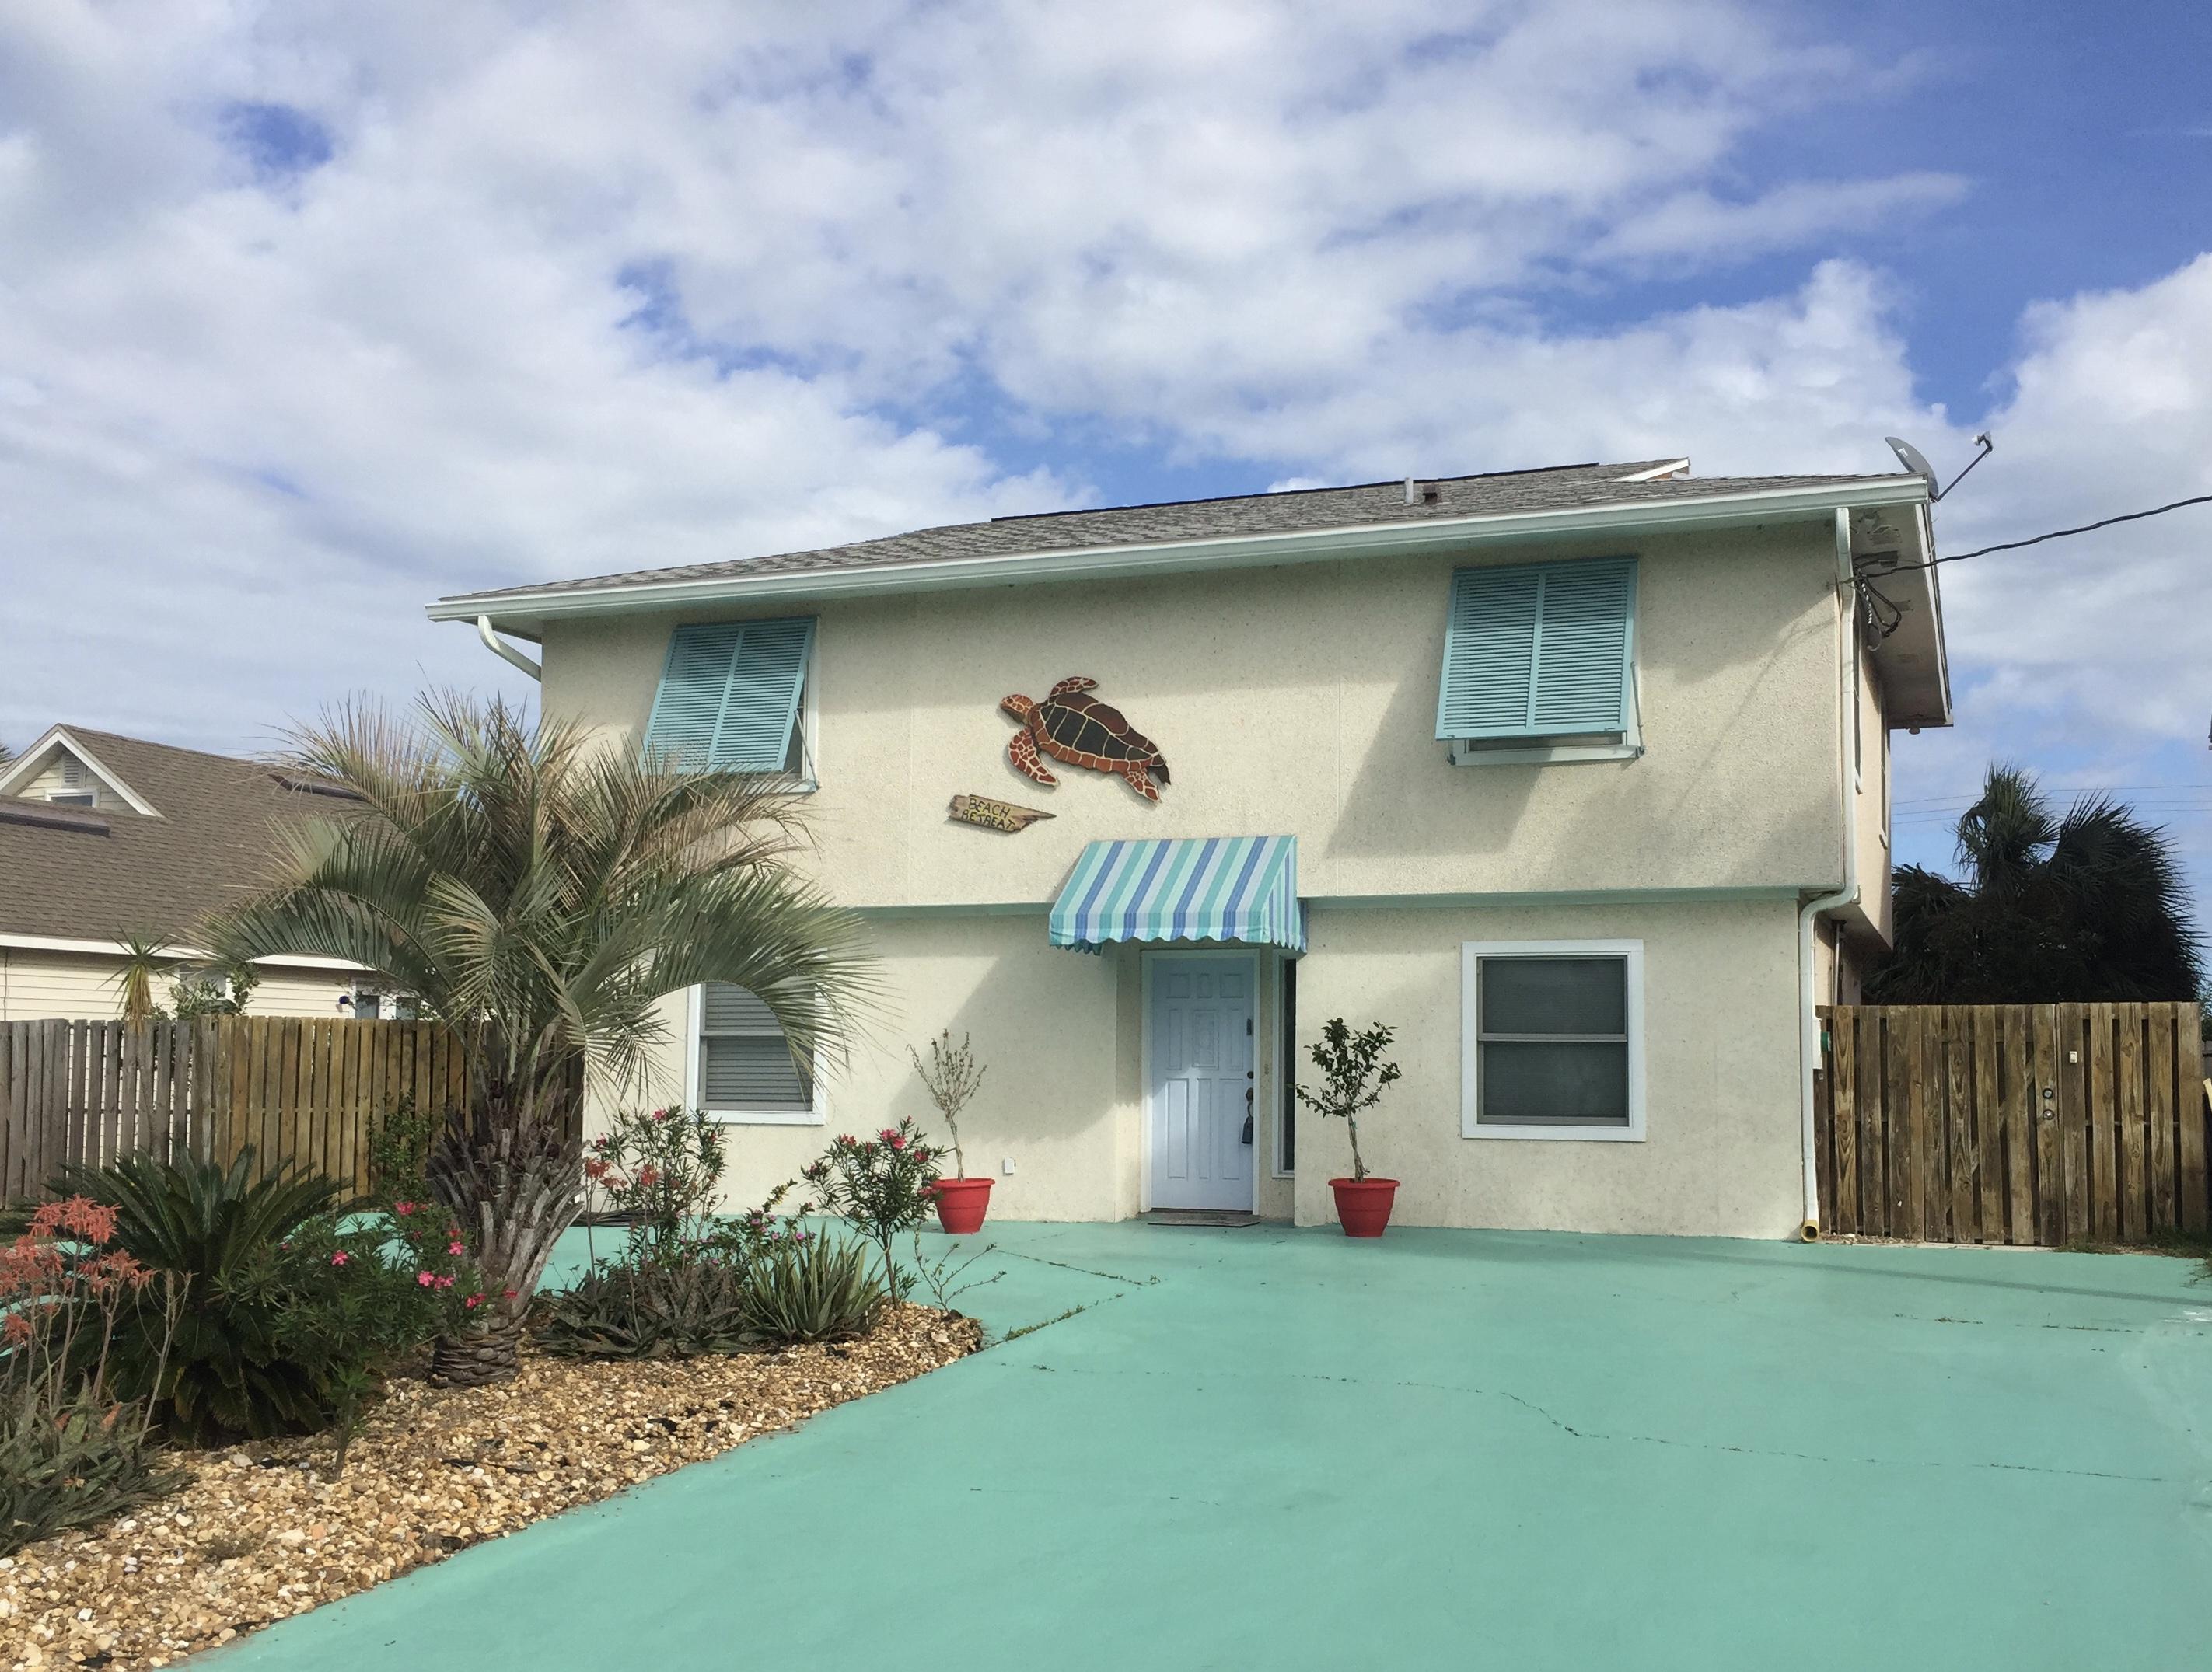 Loft/Duplex pour l Vente à 536 Tarpon 536 Tarpon Avenue Fernandina Beach, Florida, 32034 États-Unis